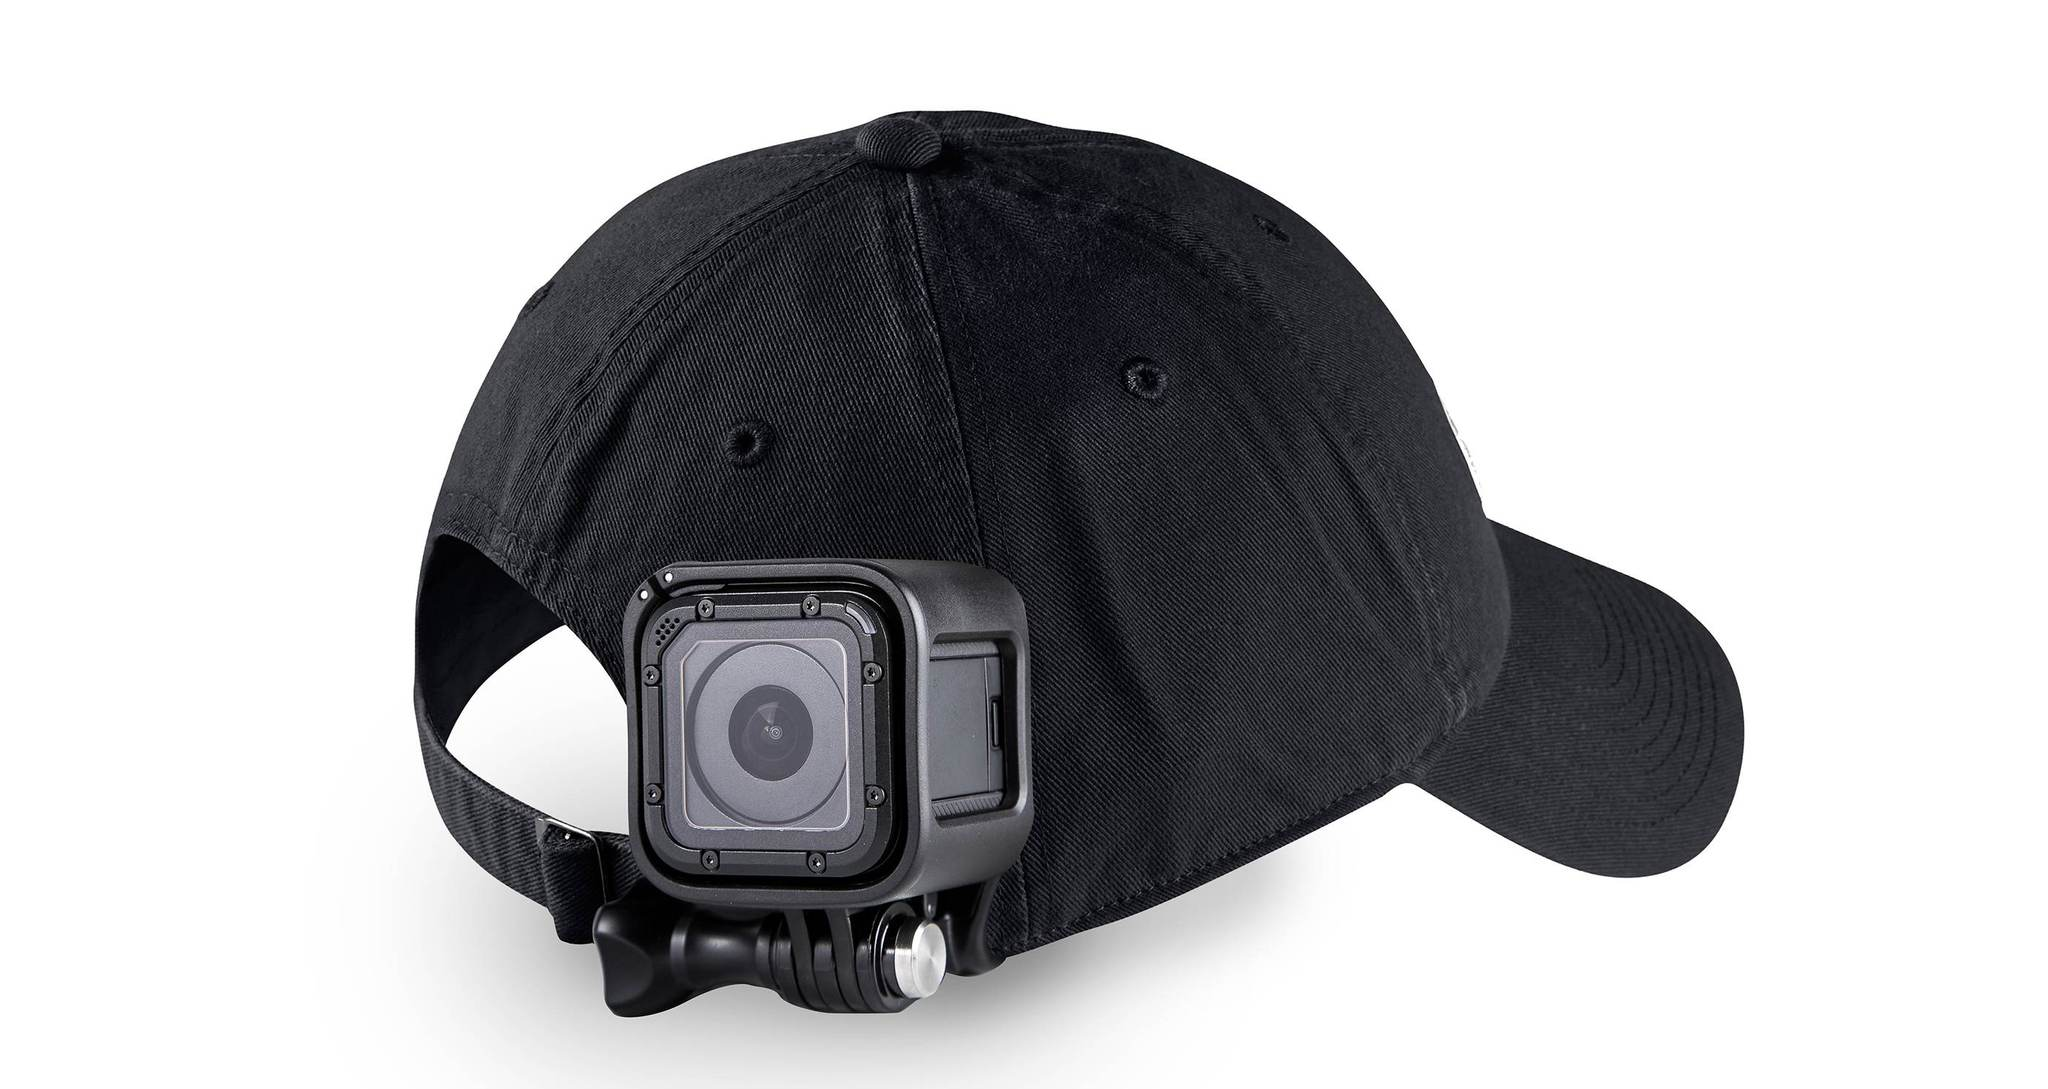 Крепление на голову + крепление-клипса на одежду Headstrap + QuickClip на кепке